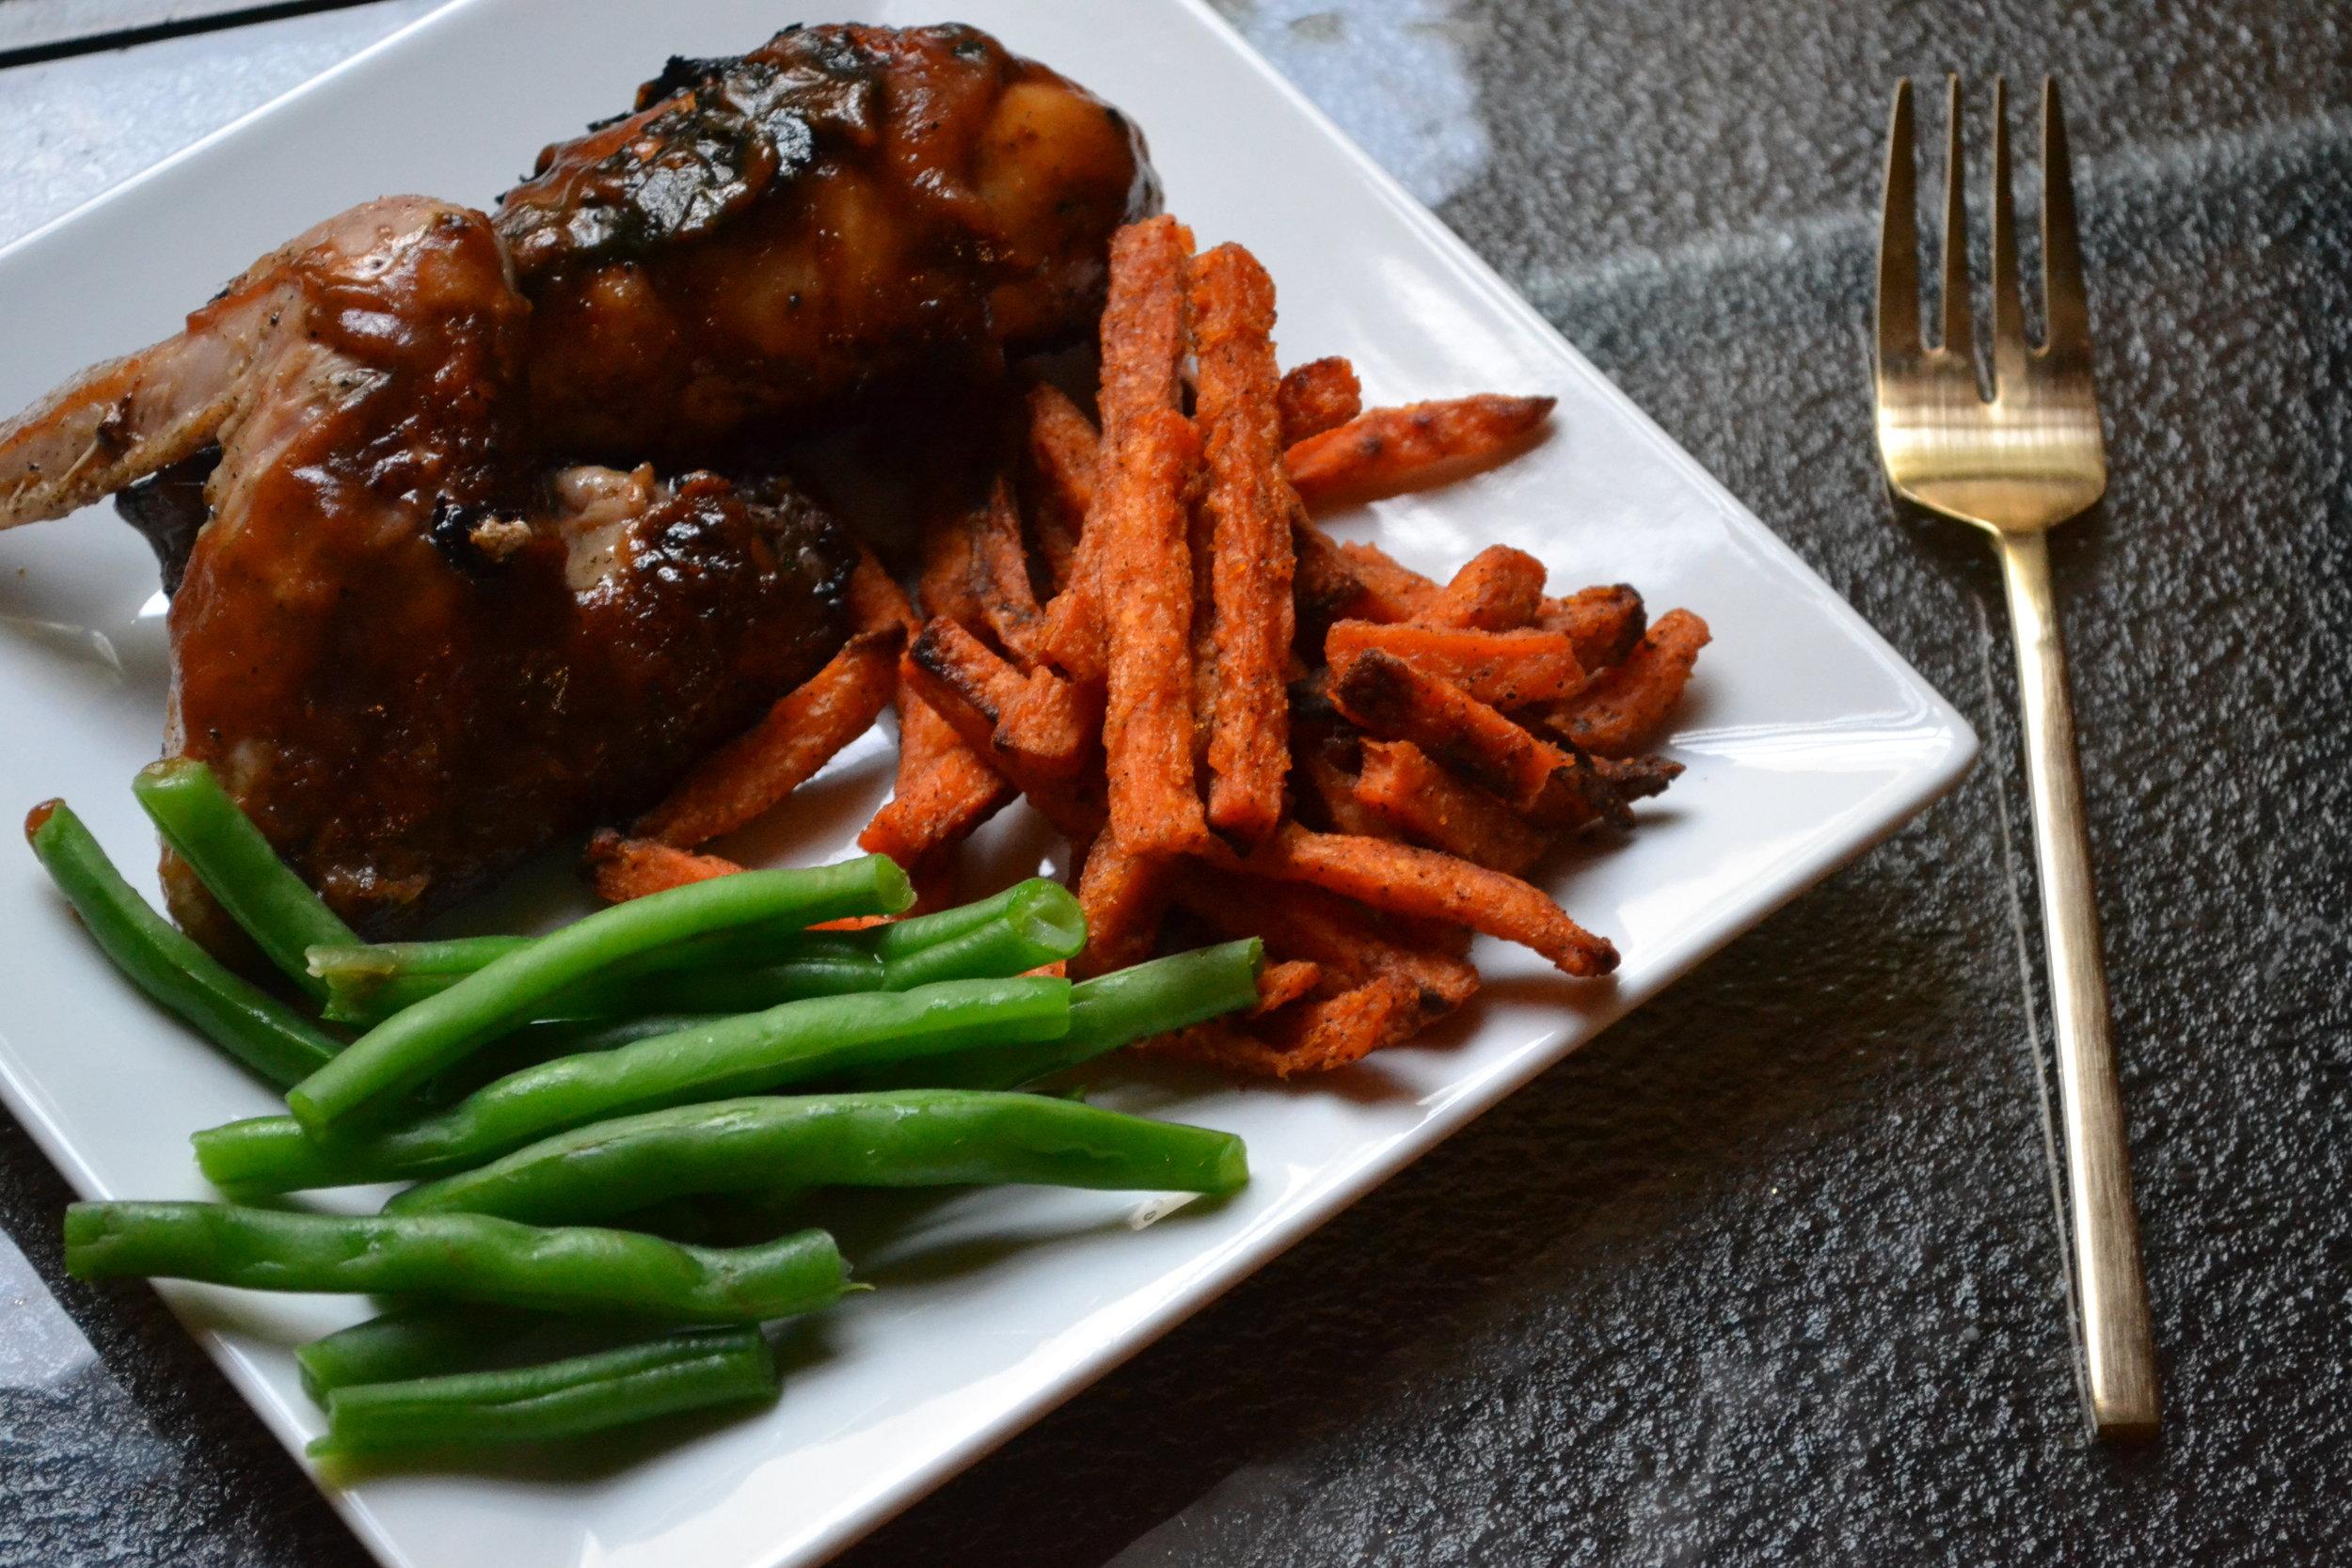 apple butter grilled chicken dinner plate